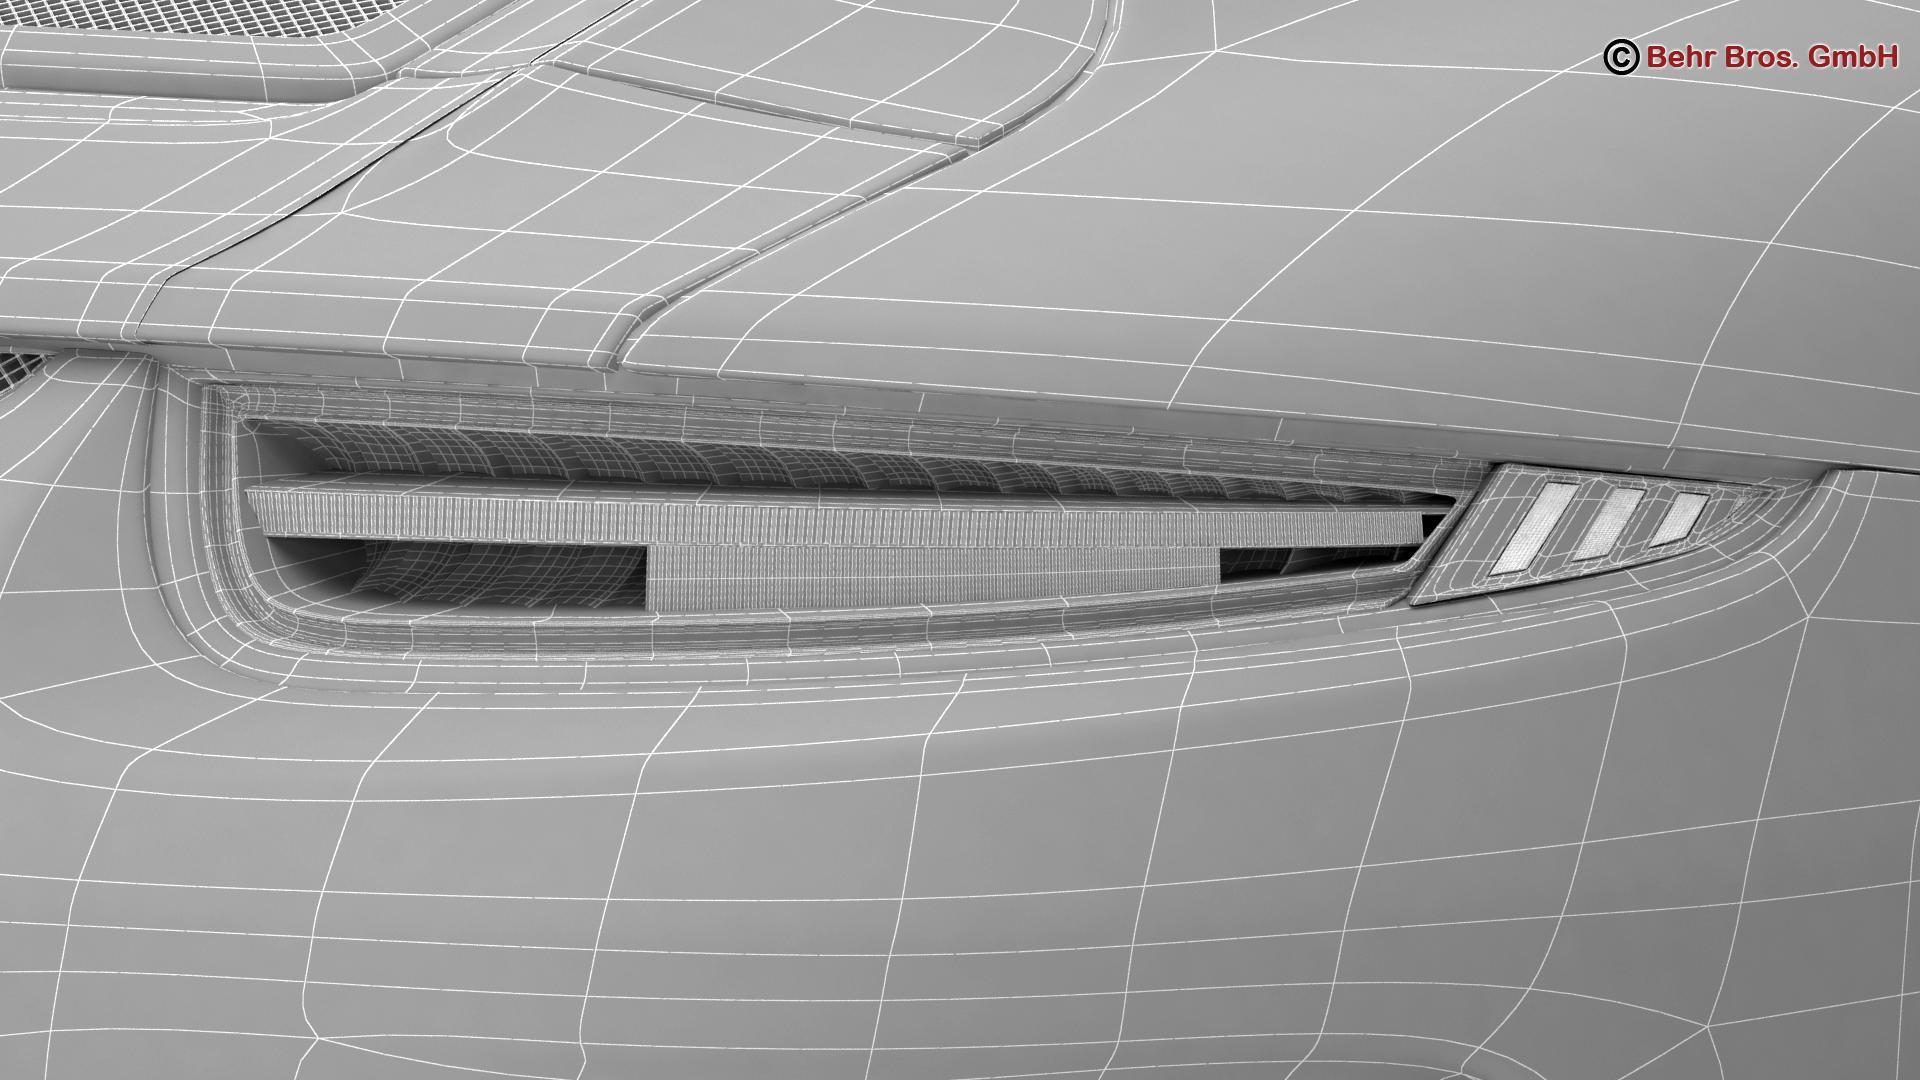 porsche 911 r 2017 3d model 3ds max fbx c4d lwo ma mb obj 220024